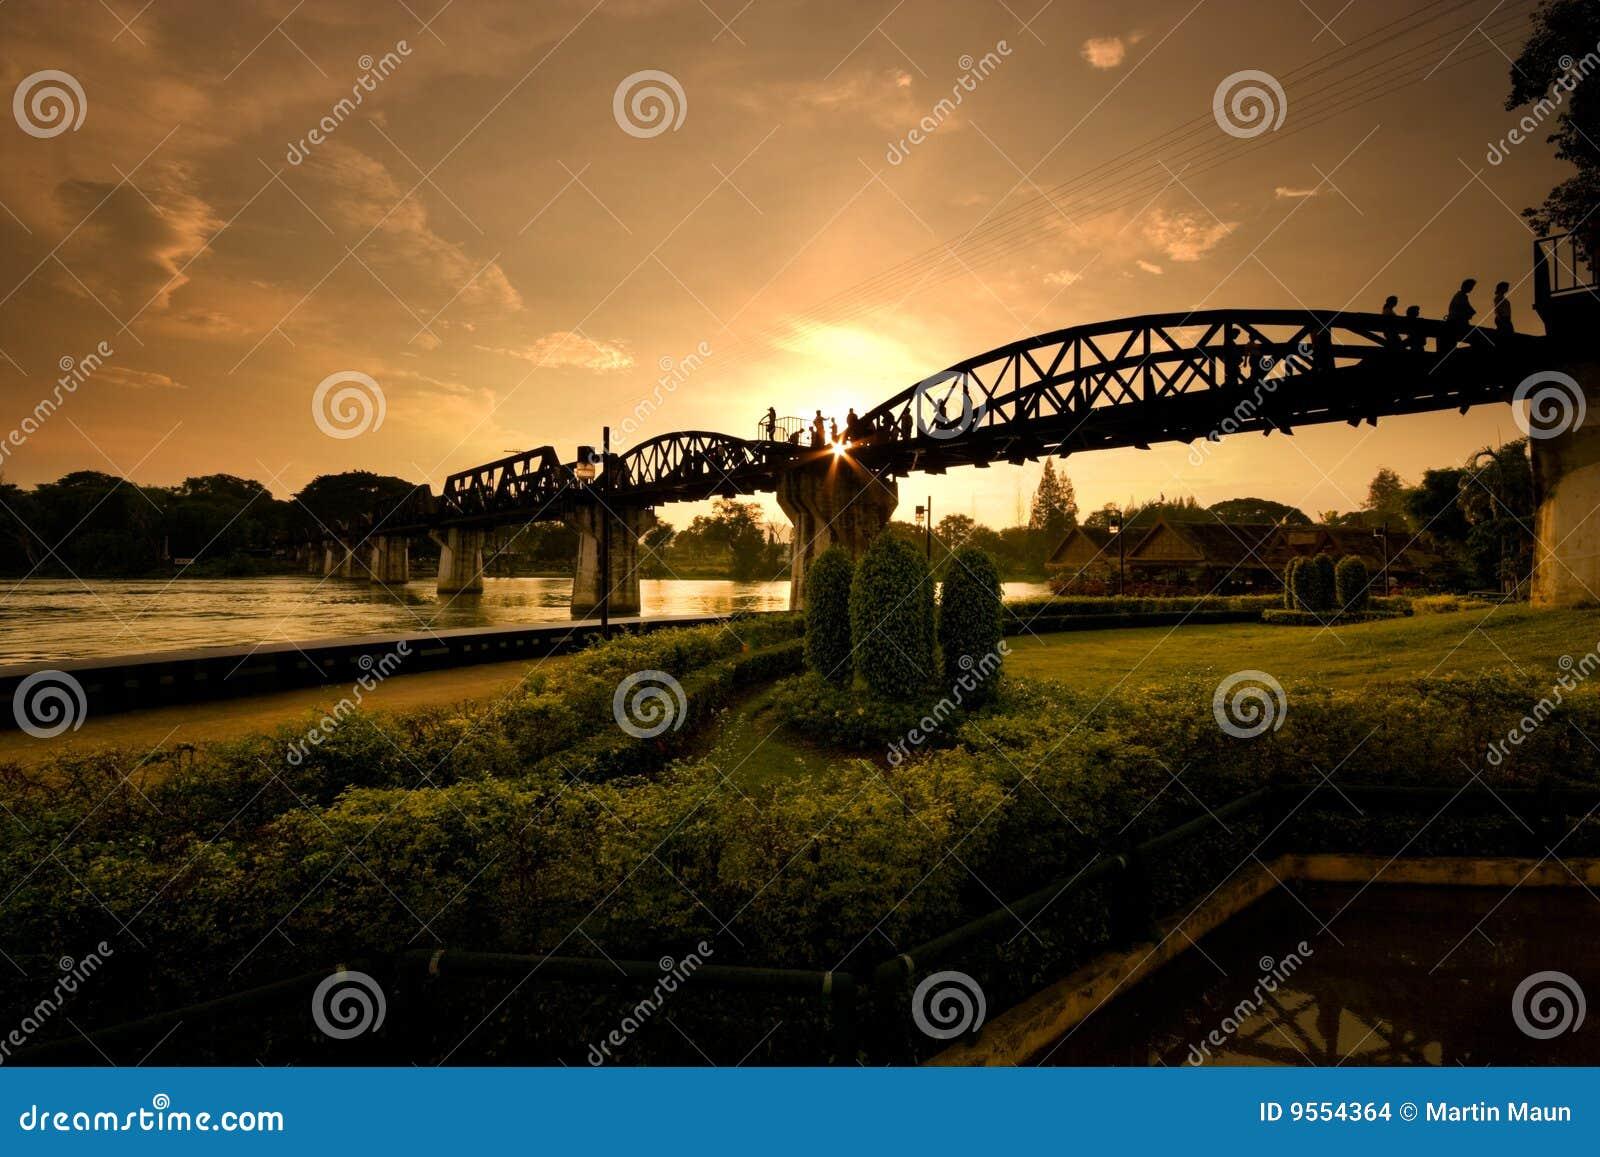 Riwer Kwai Bridge